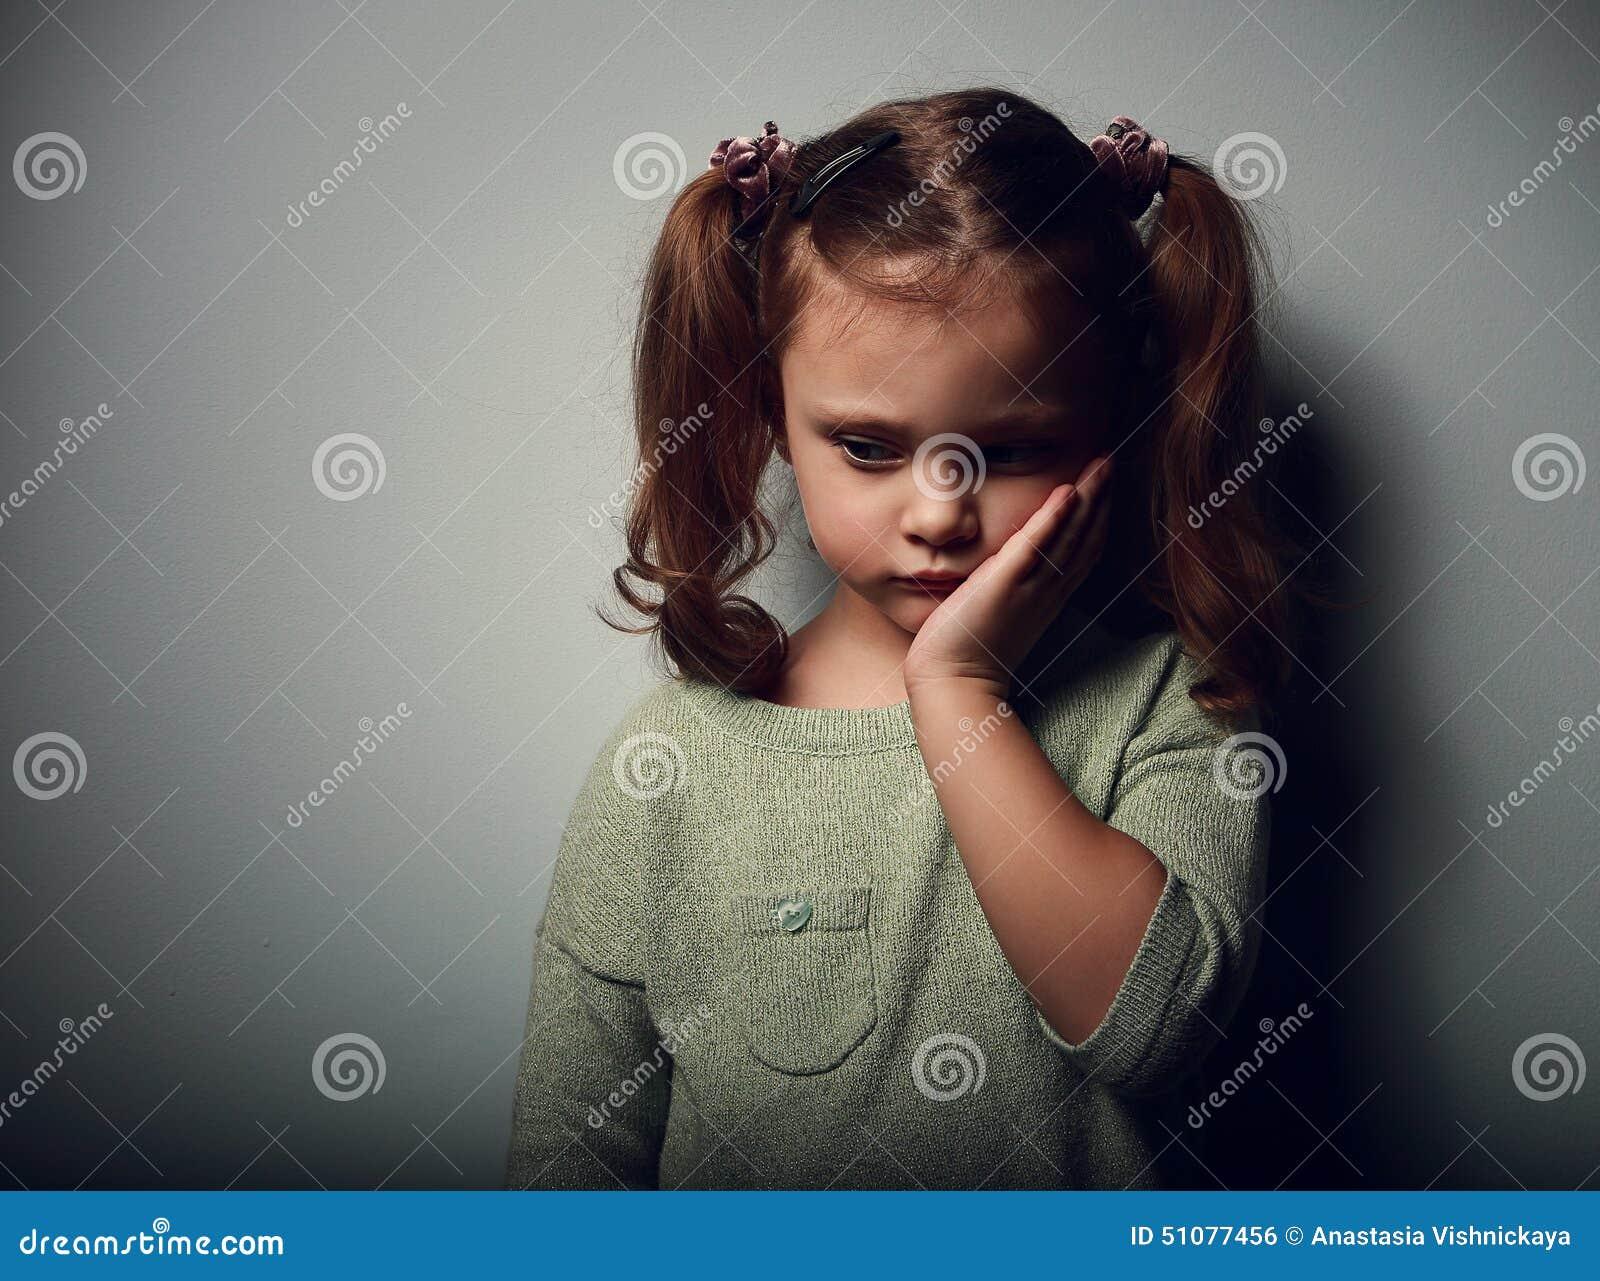 Sadness Kid Girl Looking Unhappy Closeup Portrait On Dark Stock Photo - Image 51077456-9304